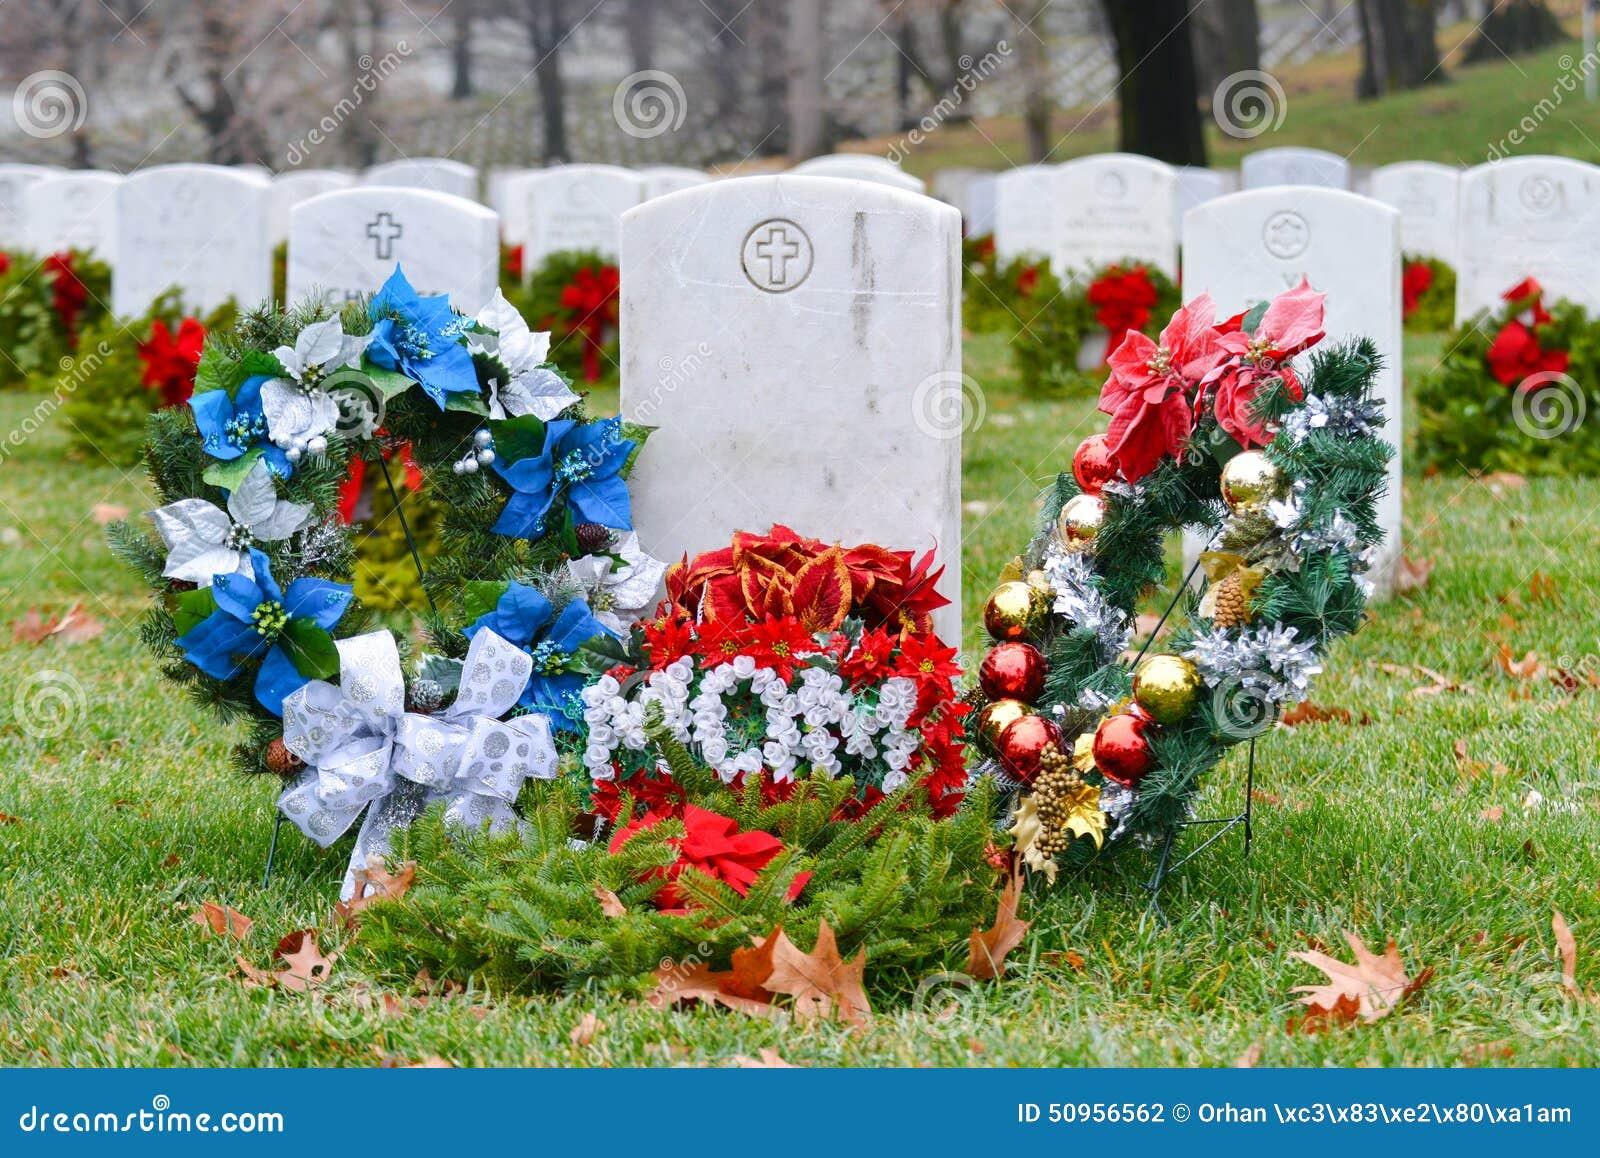 A mom s gravestone in Arlington National Cemetery - Washington DC